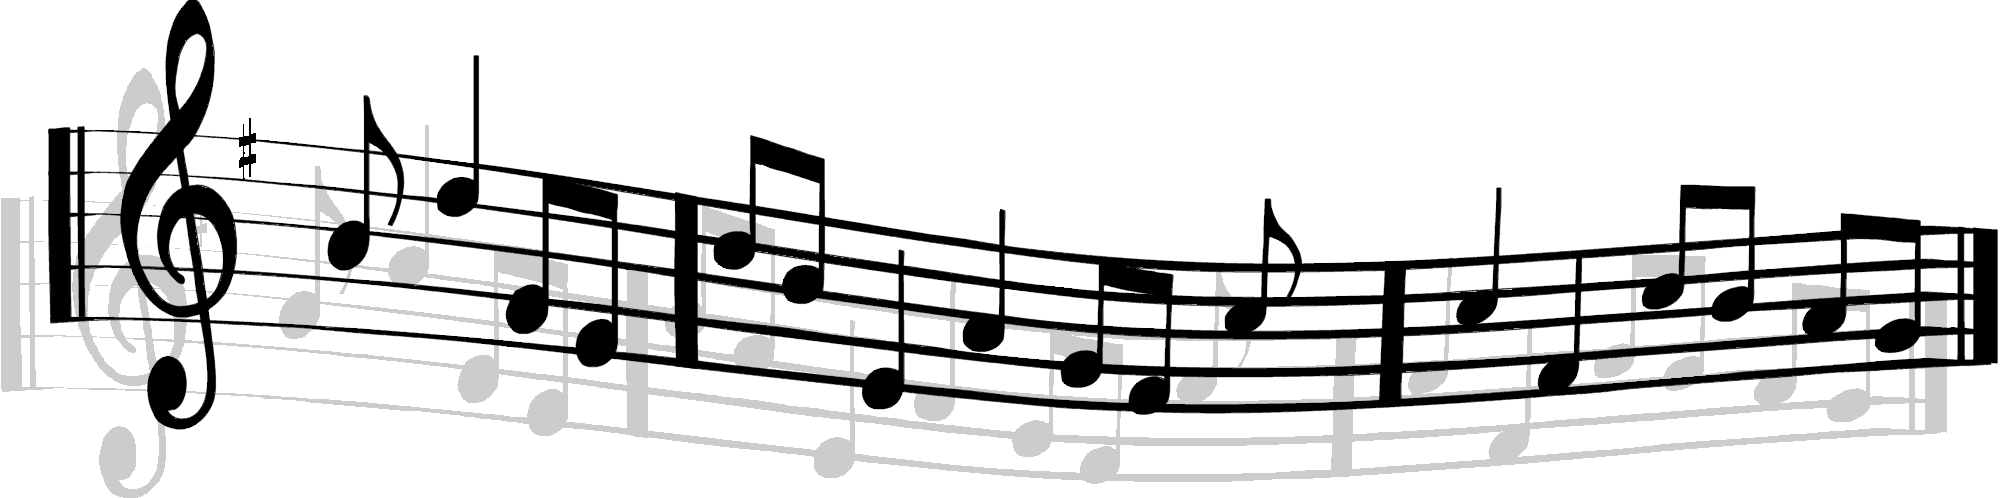 Music staff panda free. Musical clipart banner